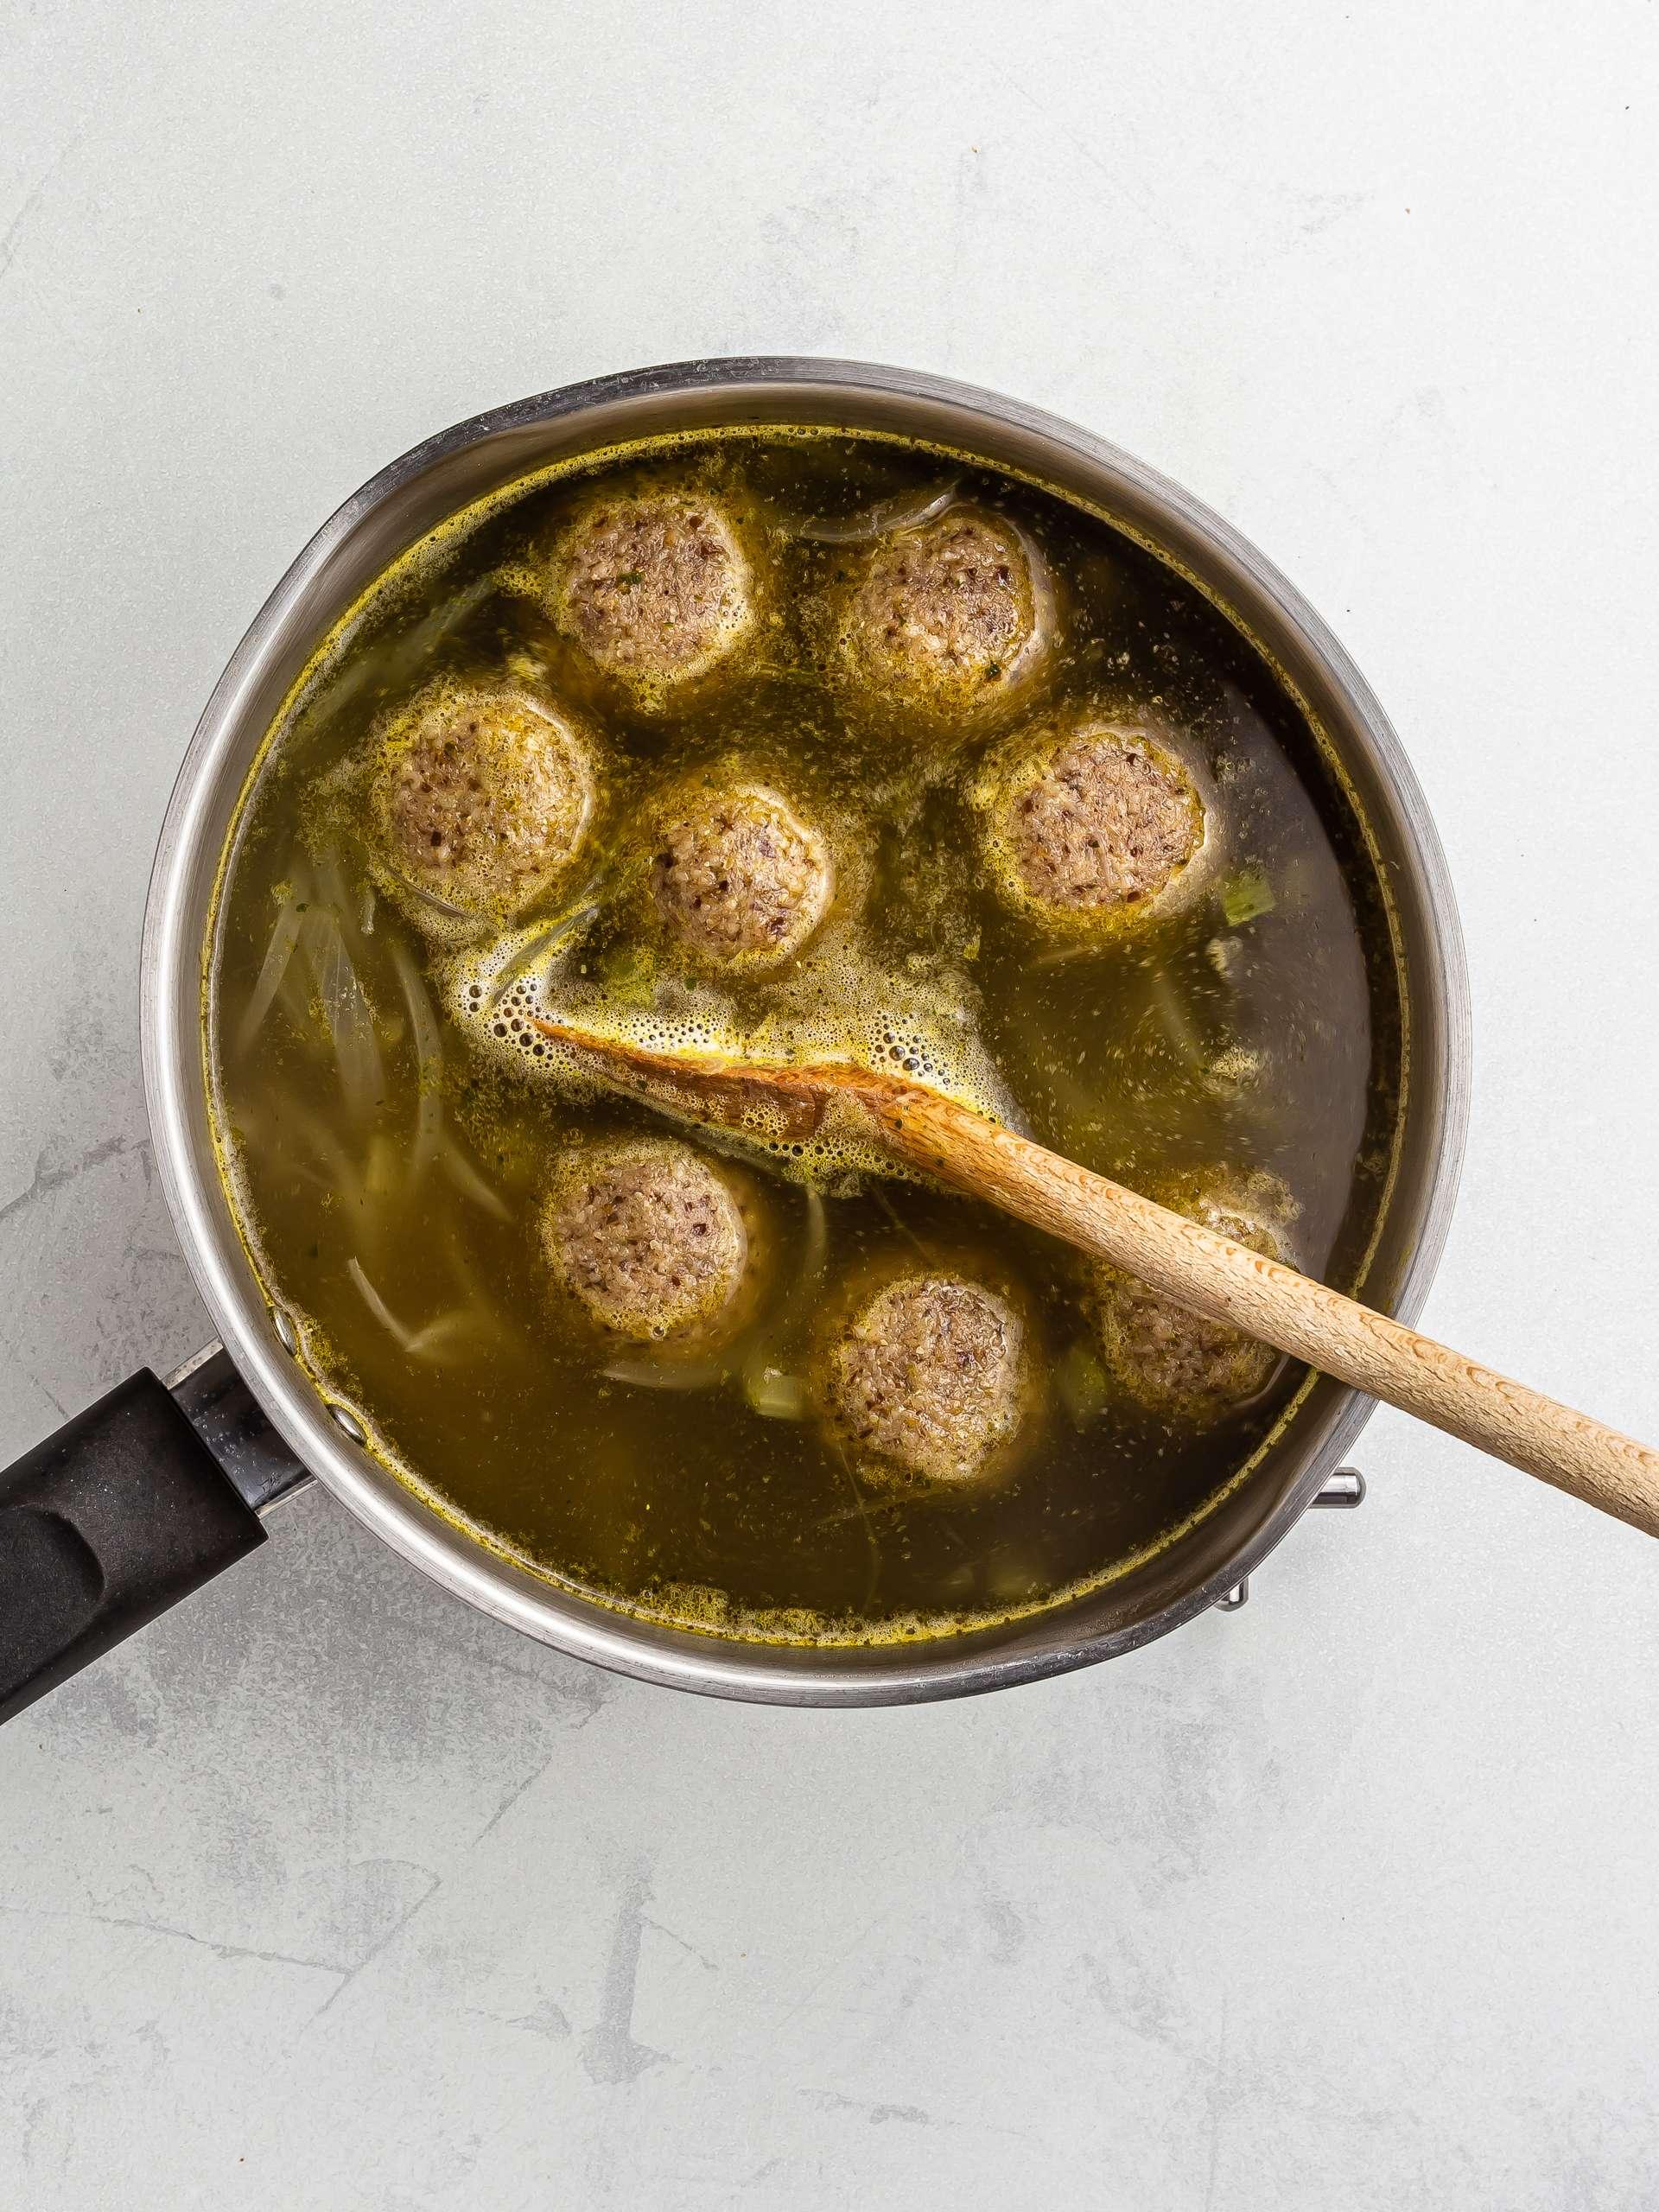 cooking matzo balls in a soup